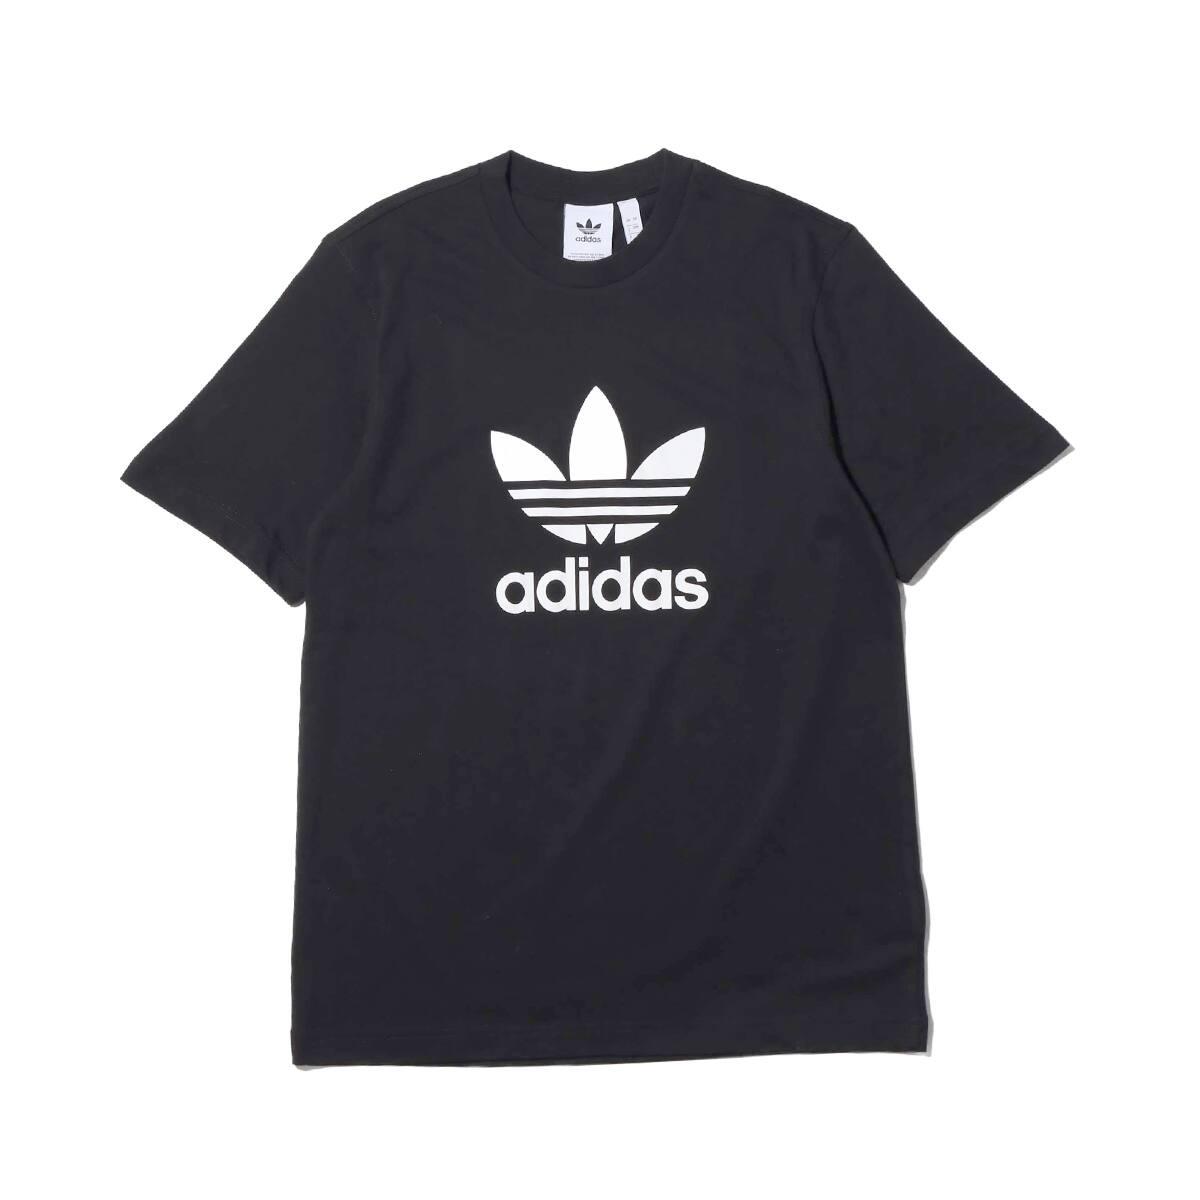 adidas Originals TREFOIL TEE Black 19SS-I_photo_large